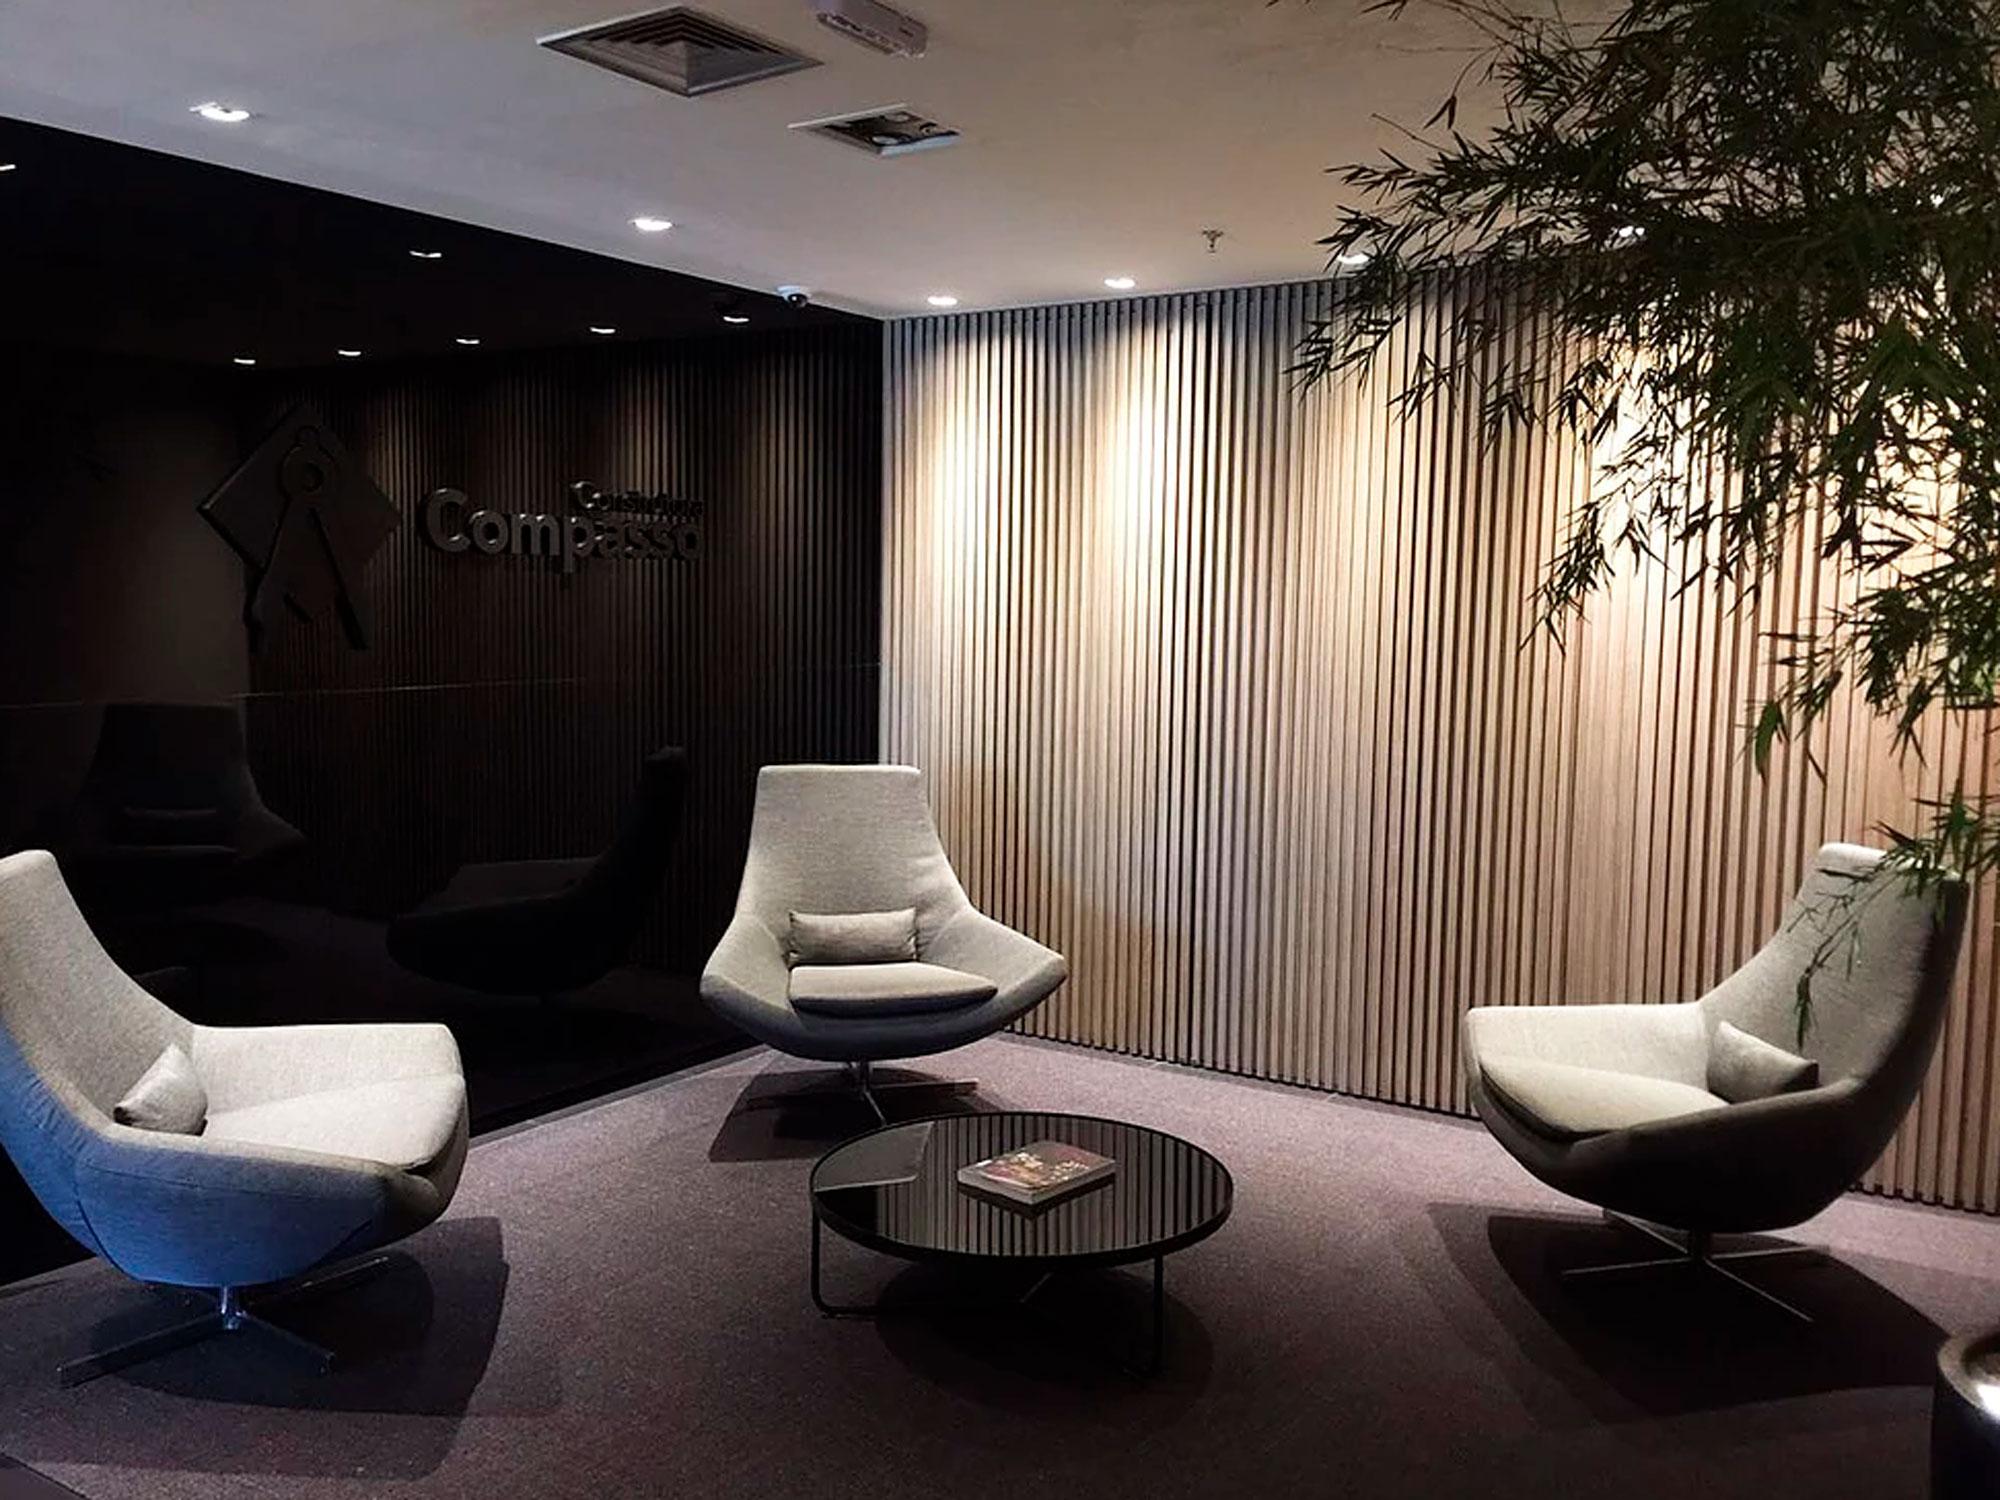 Studio FUV | Marcenaria Corporativa